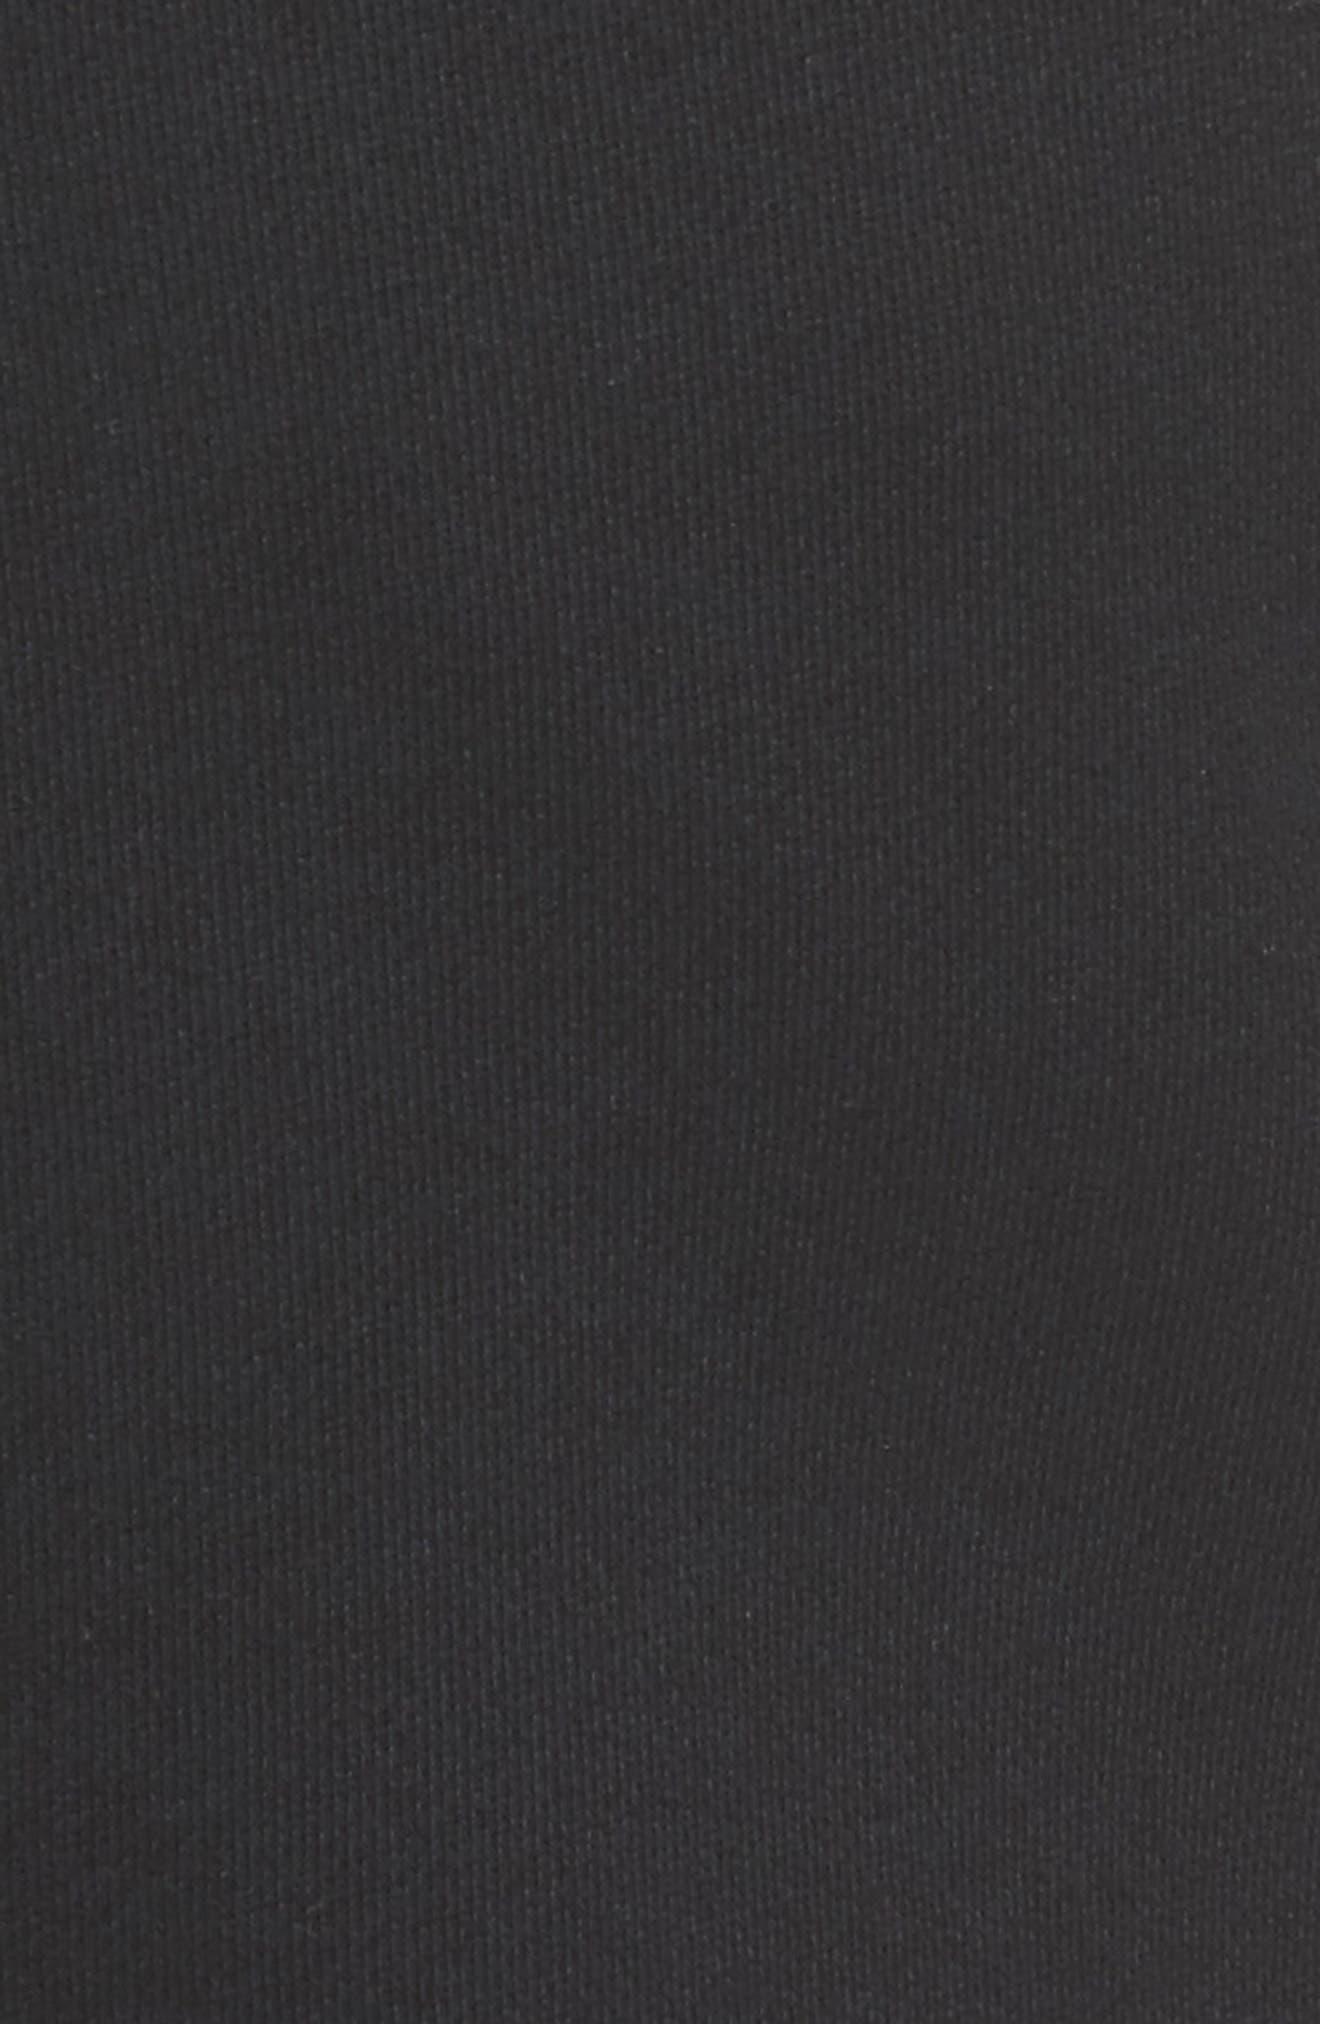 Regular Fit Sweatpants,                             Alternate thumbnail 5, color,                             Black